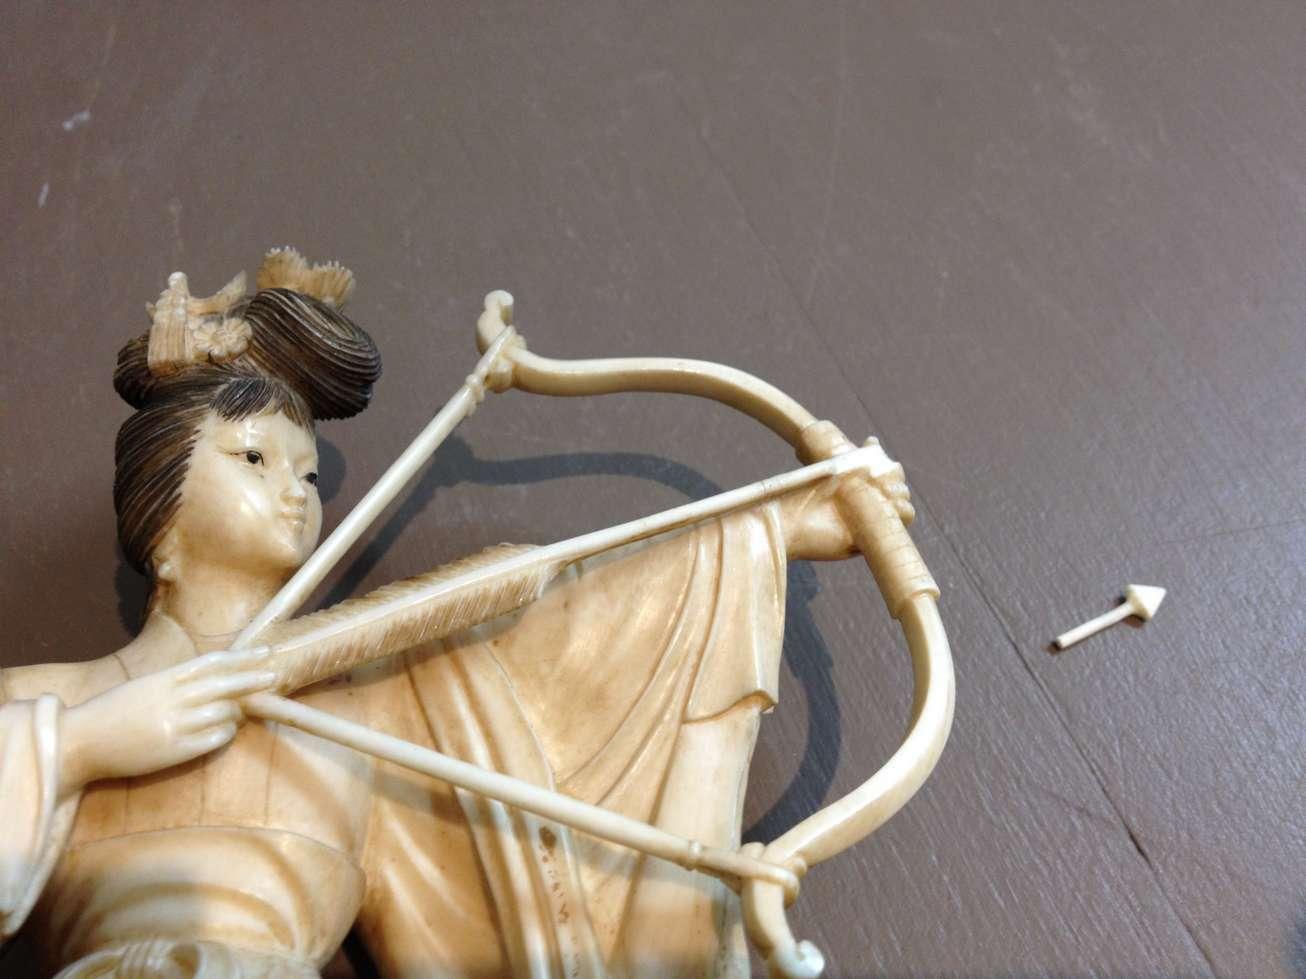 femme-fleche-ivoire-chine-art-restaurarte.jpg